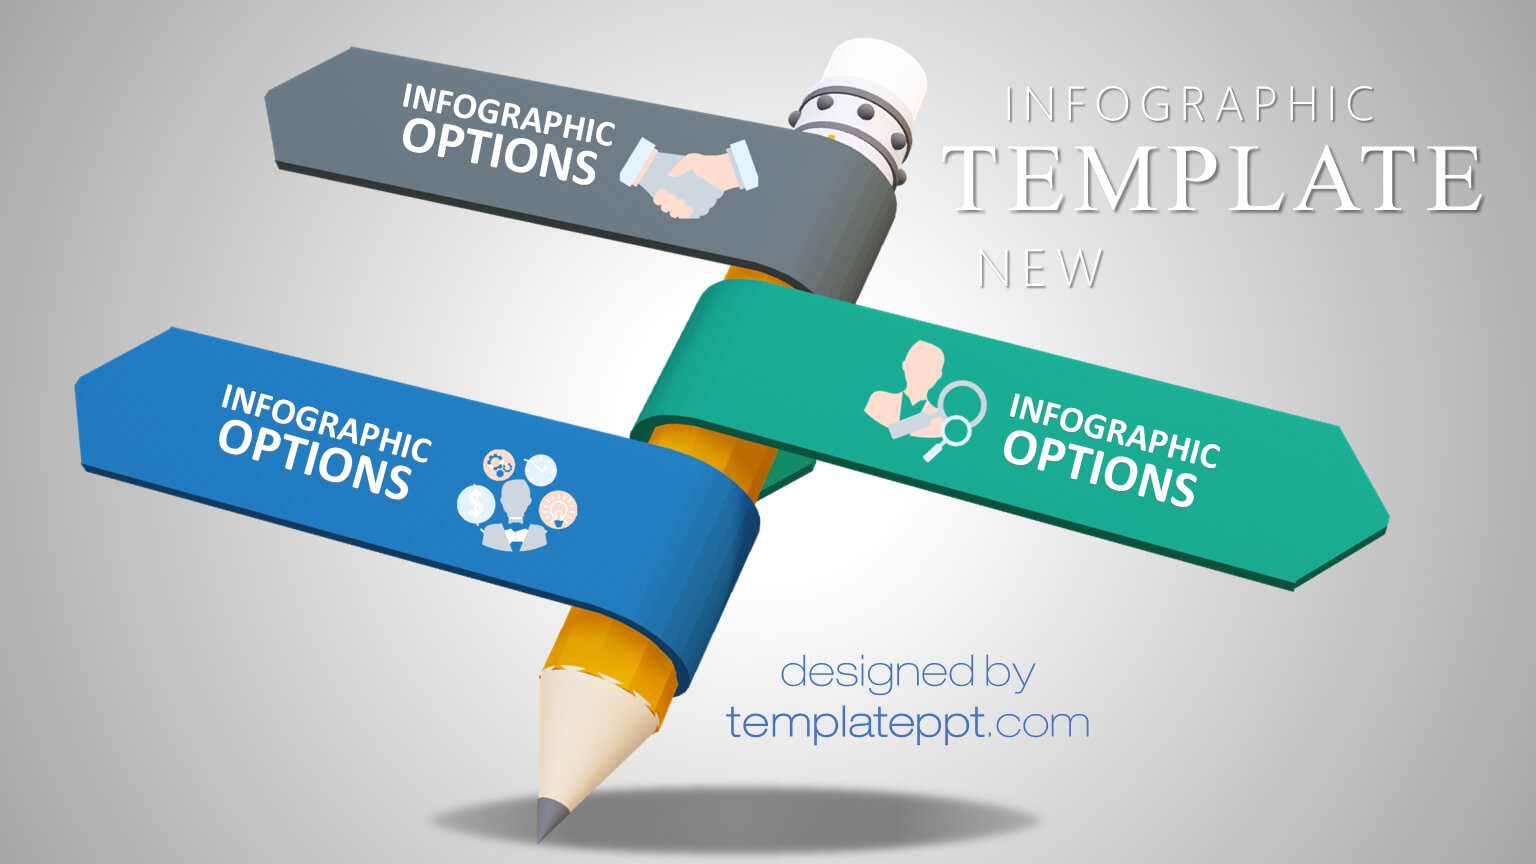 Free Powerpoint Presentation Templates Downloads Design 2007 For Free Powerpoint Presentation Templates Downloads